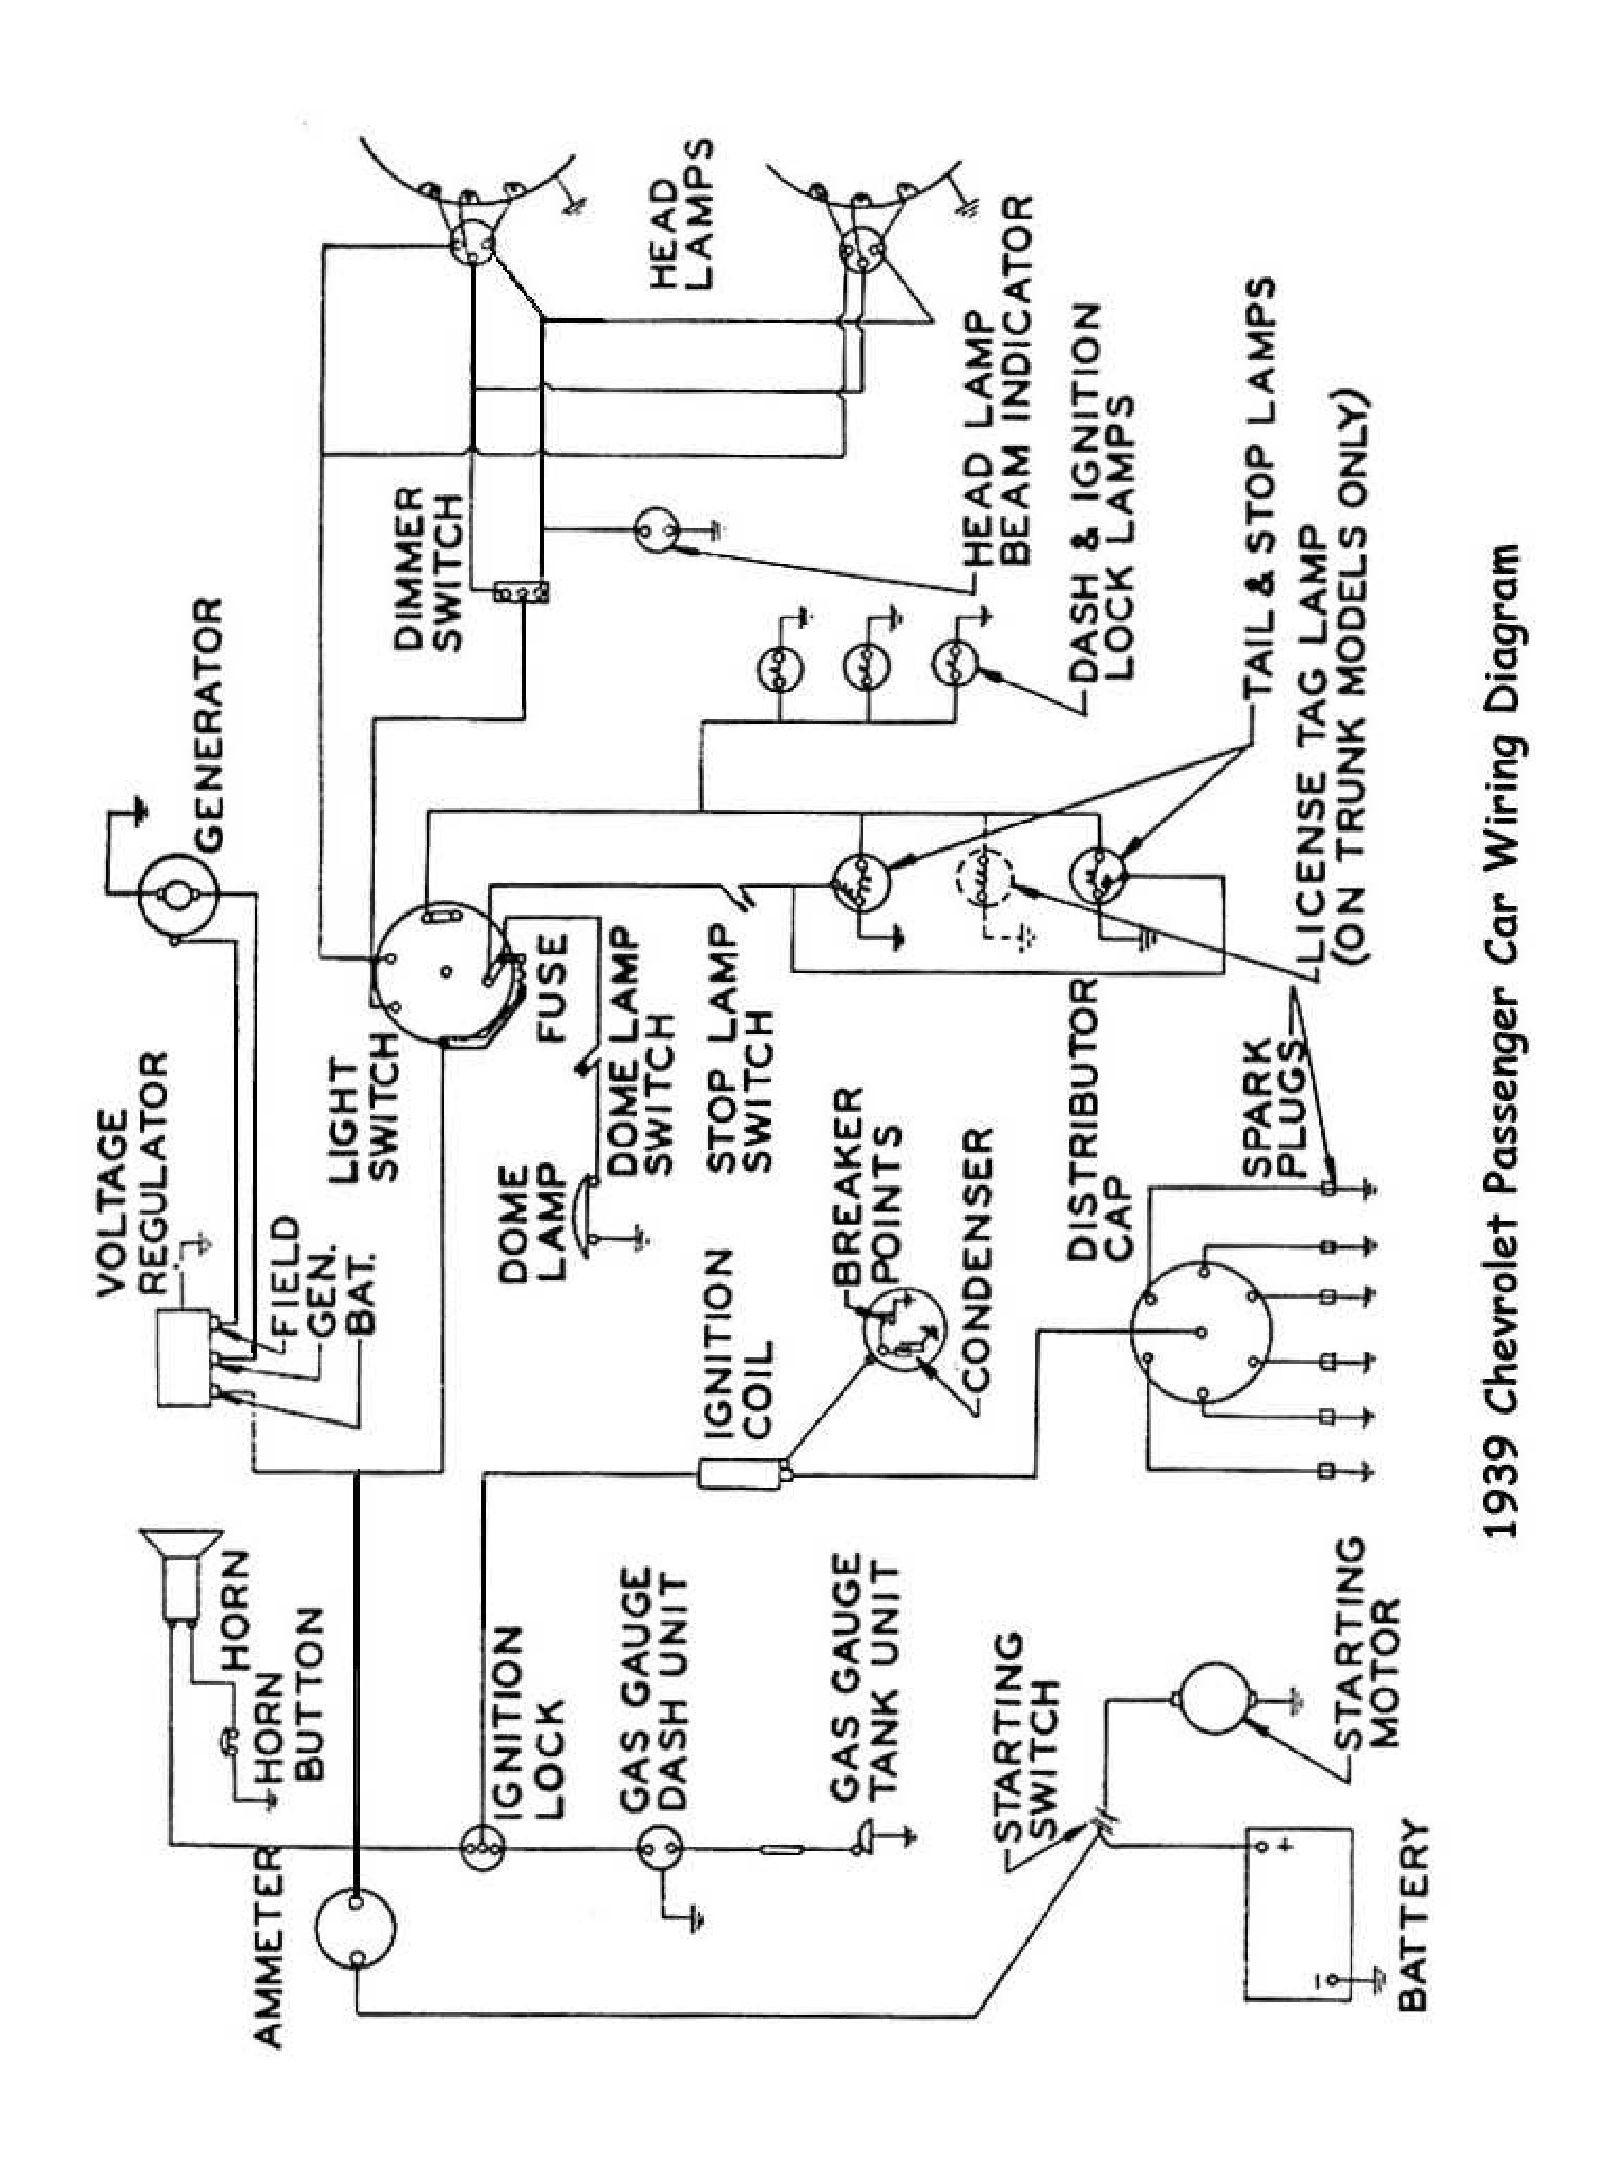 Basic Engine Wiring Diagram Bike Chinese Atv 49cc Bulldog Vehicle Remote Start And Keyless Entry Installation Security Of